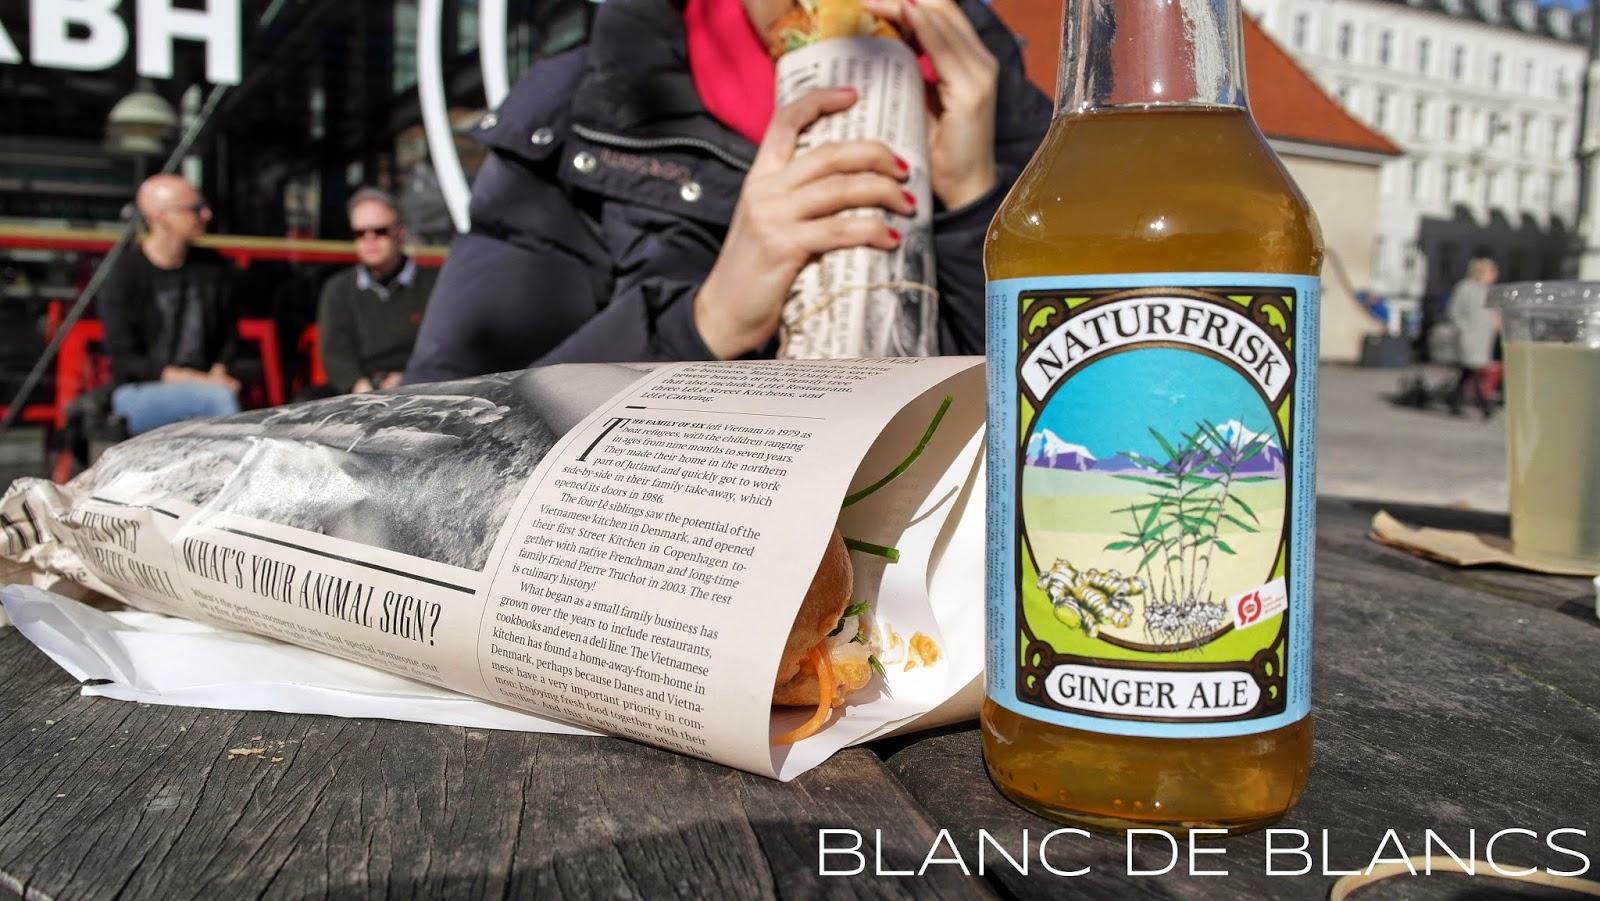 Banh mi @ Torvehallerne - www.blancdeblancs.fi